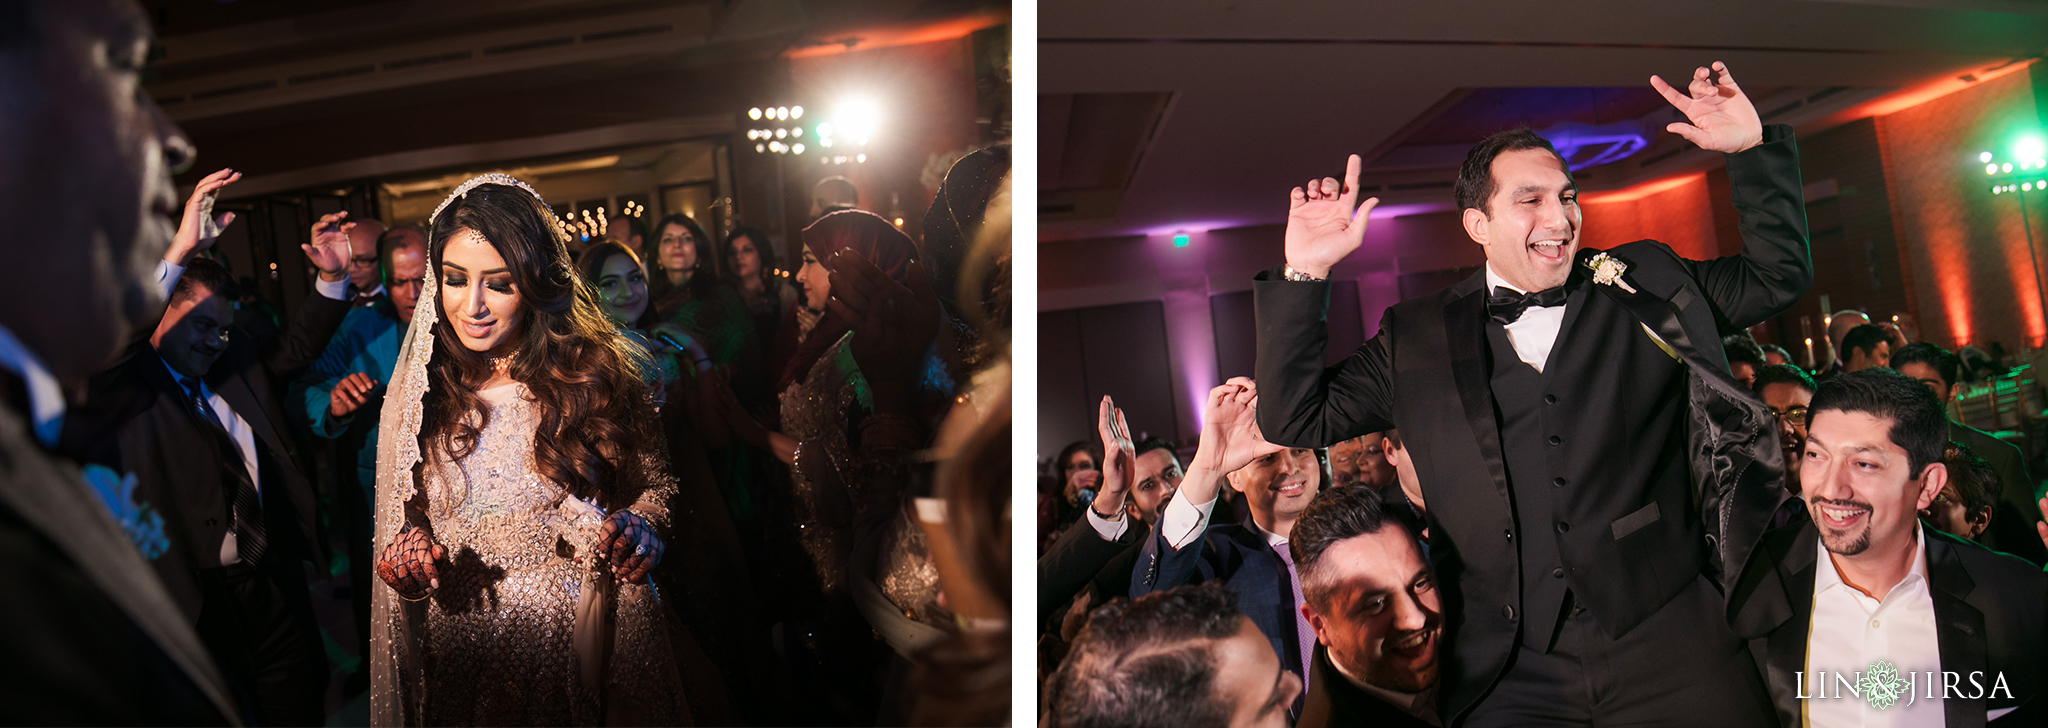 40 pasea hotel spa huntington beach pakistani muslim wedding photography